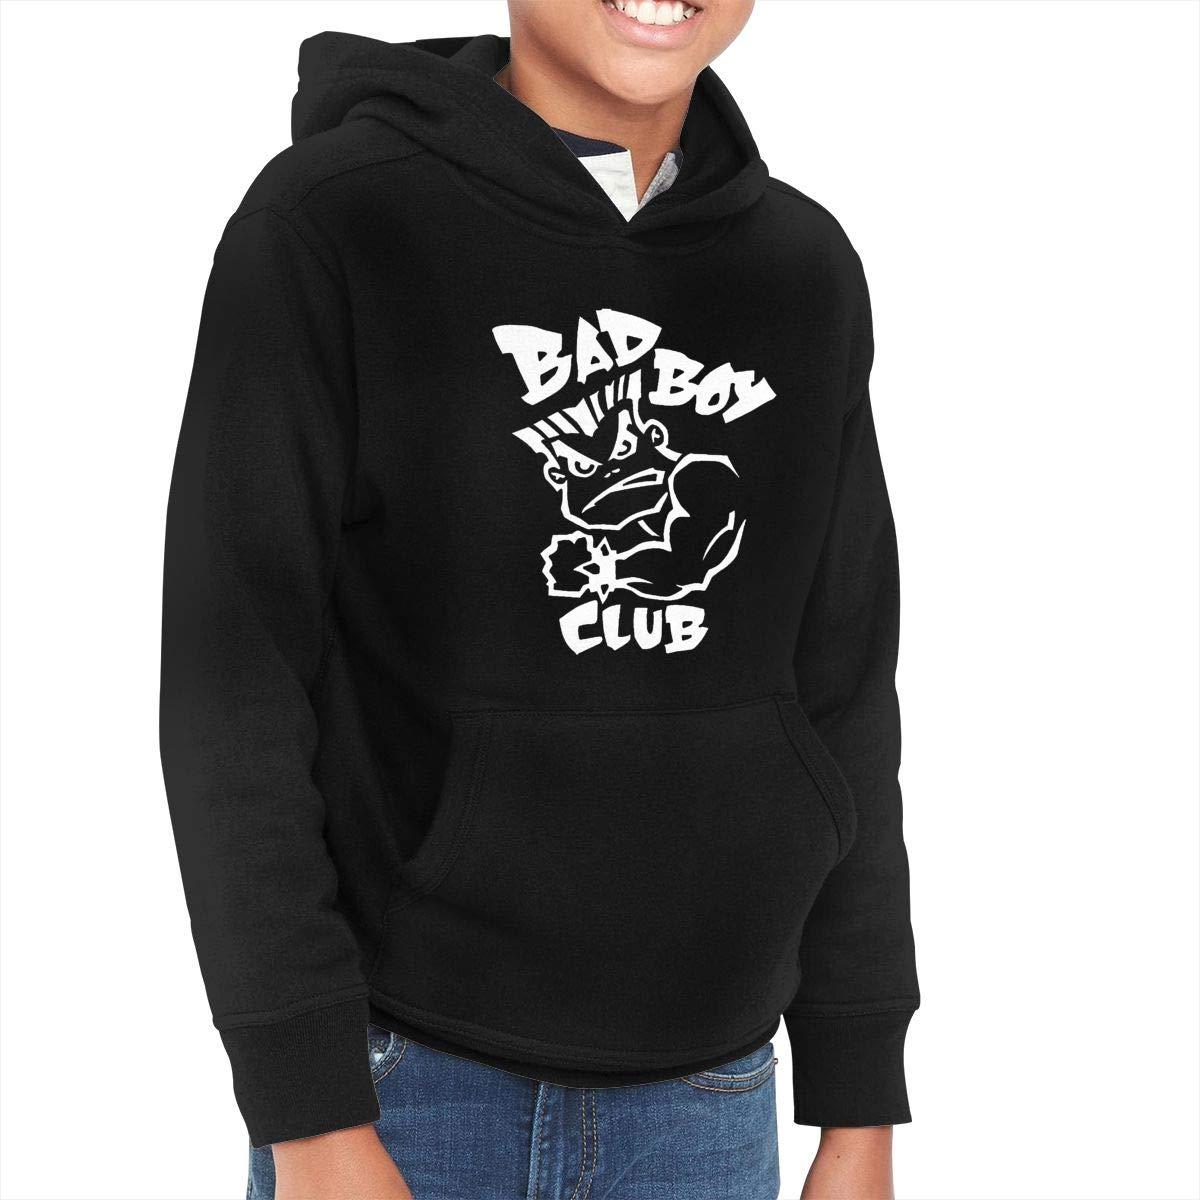 Eggpapa Bad Logo '&children's Hooded Pocket Sweater Black Shirts